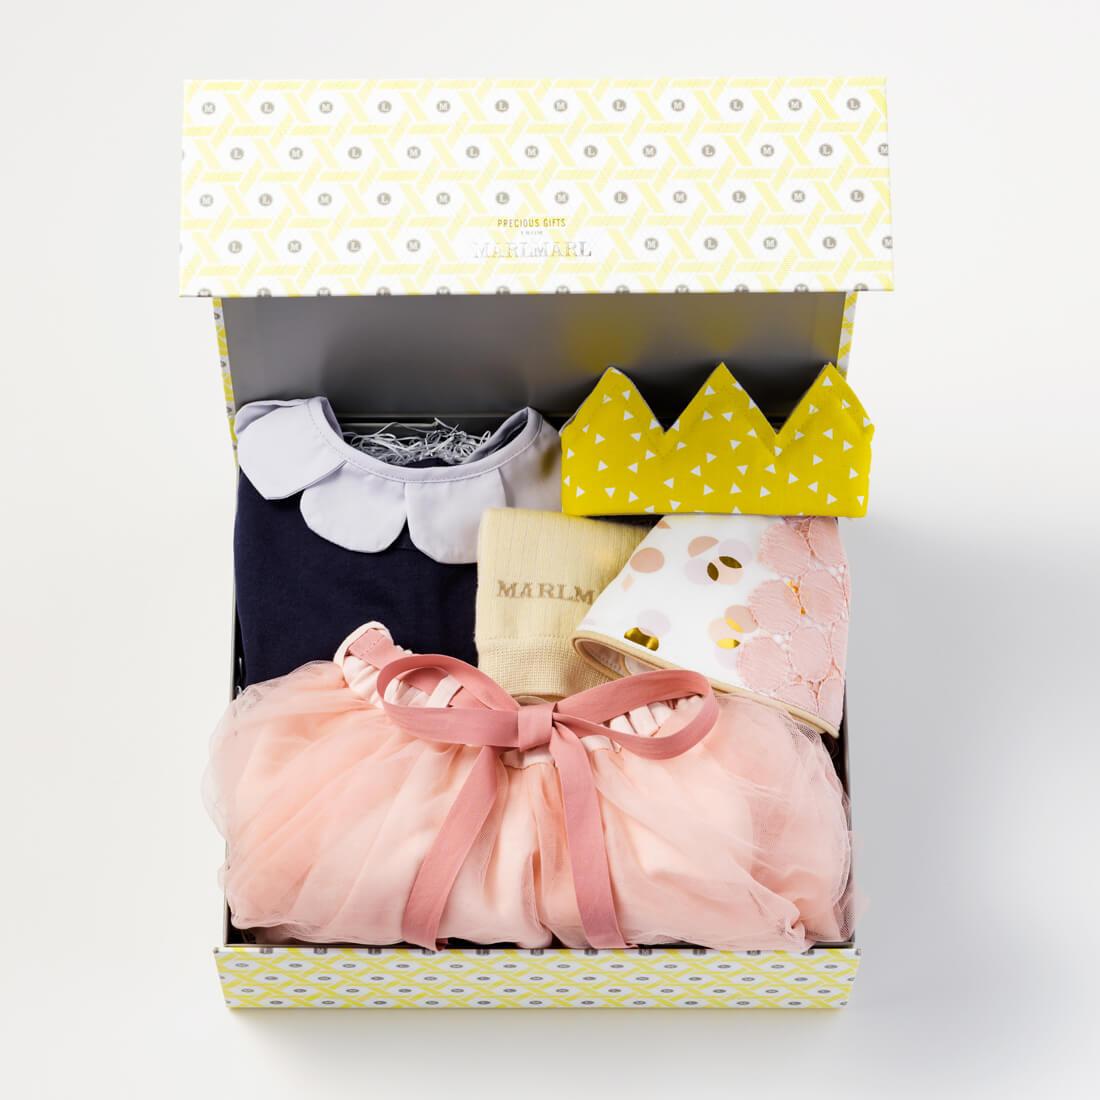 MARLMARL Seasonal Gift Set Icing on the-cake